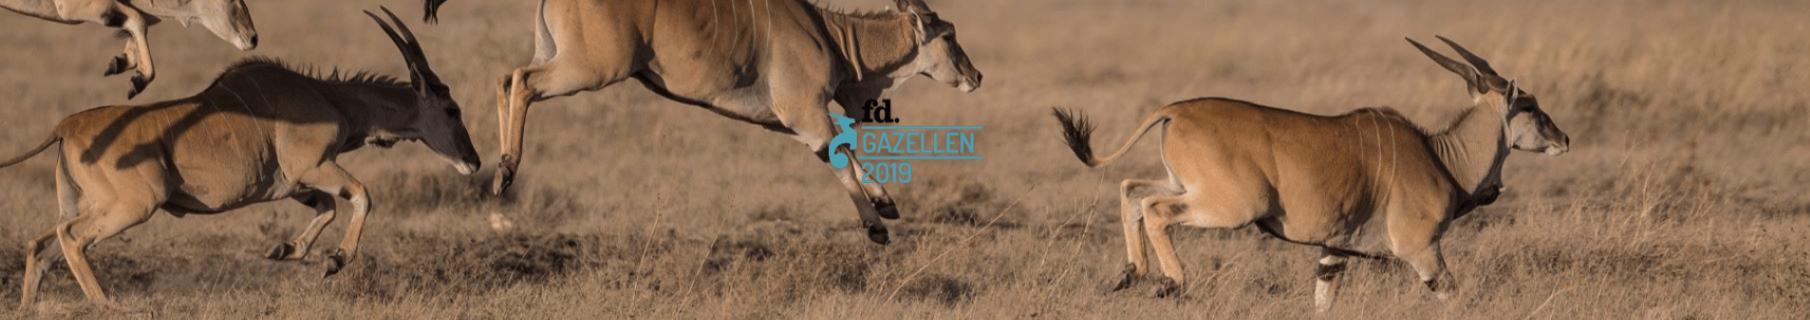 Gazelle-7-compressor